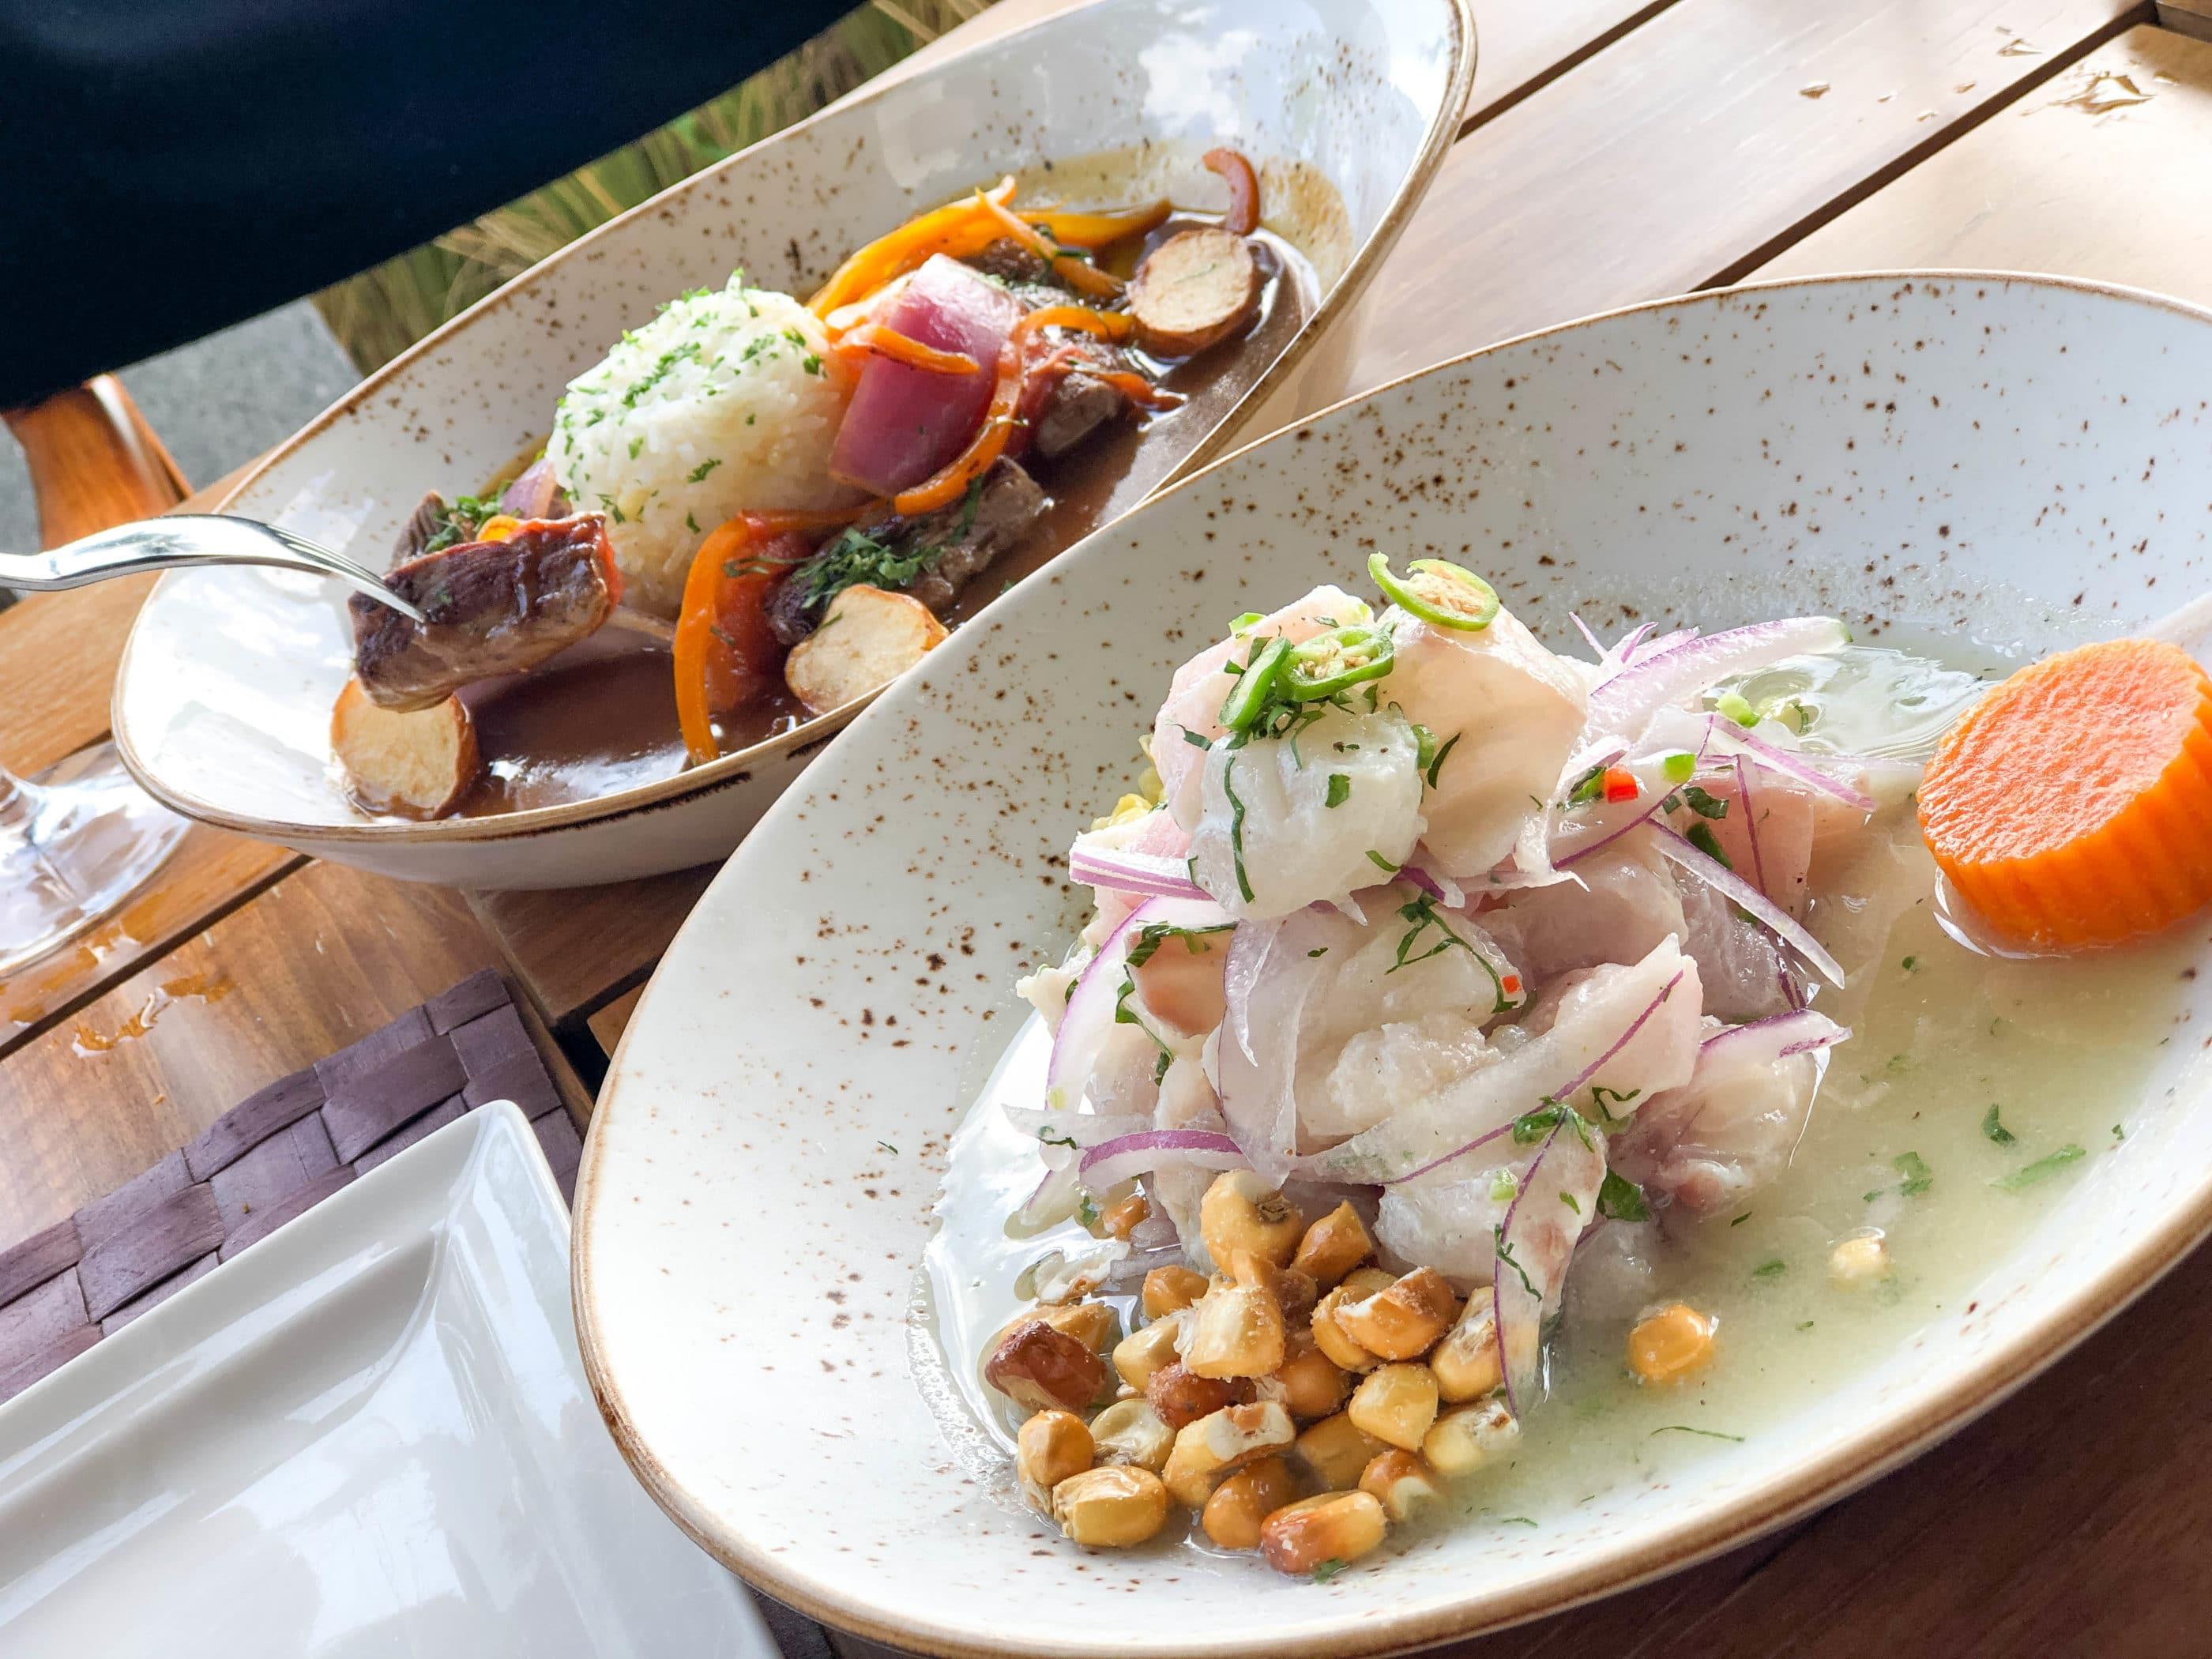 Fish and octopus ceviche at Ni Peruvian restaurant